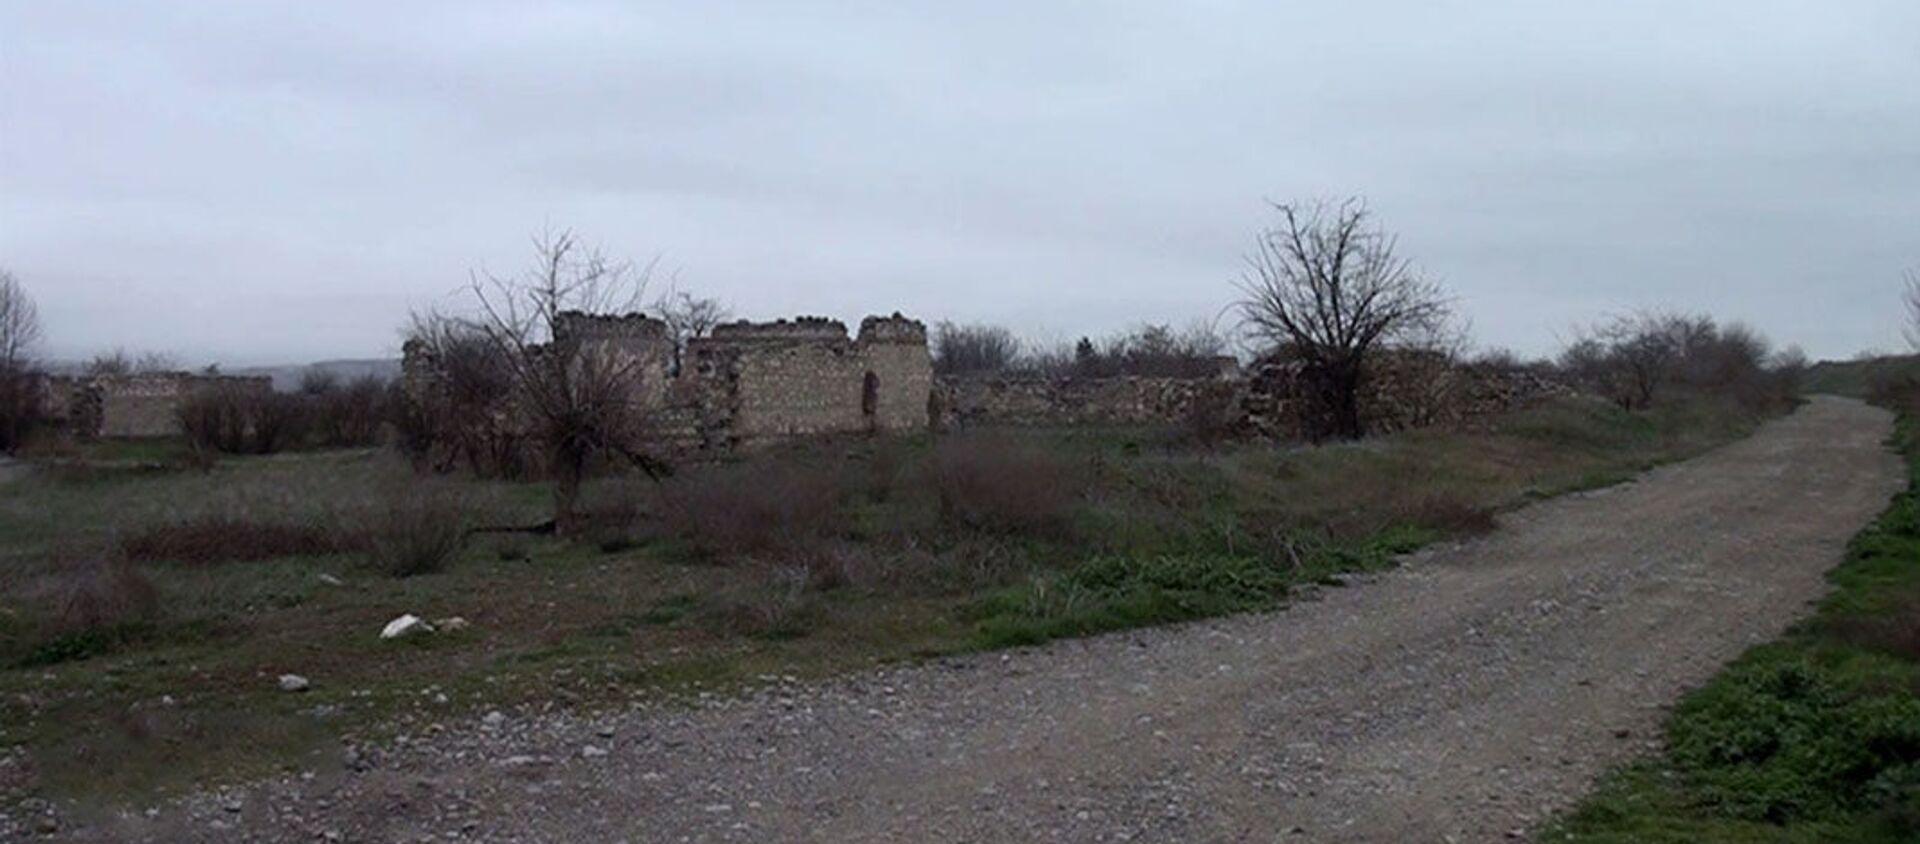 Mehdili kəndi - Sputnik Азербайджан, 1920, 19.04.2021